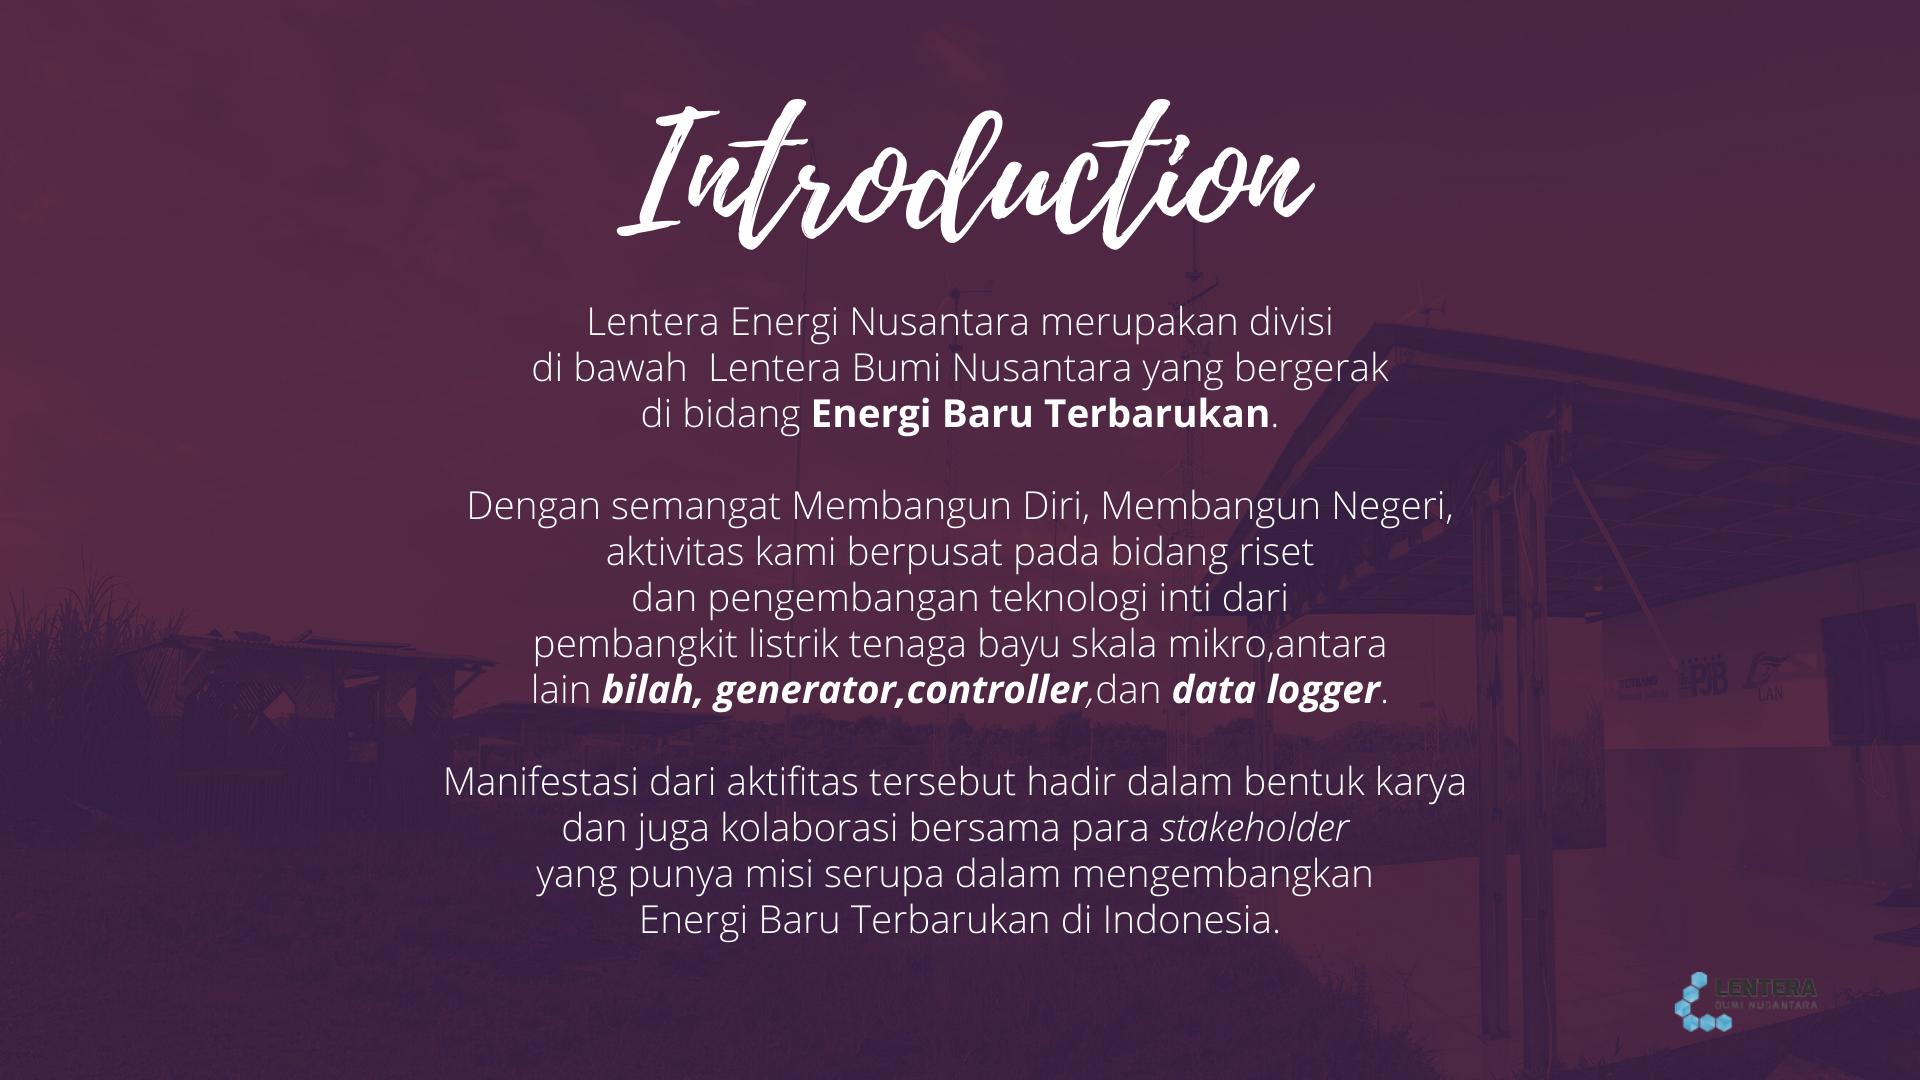 lentera energi nusantara ciheras lentera bumi